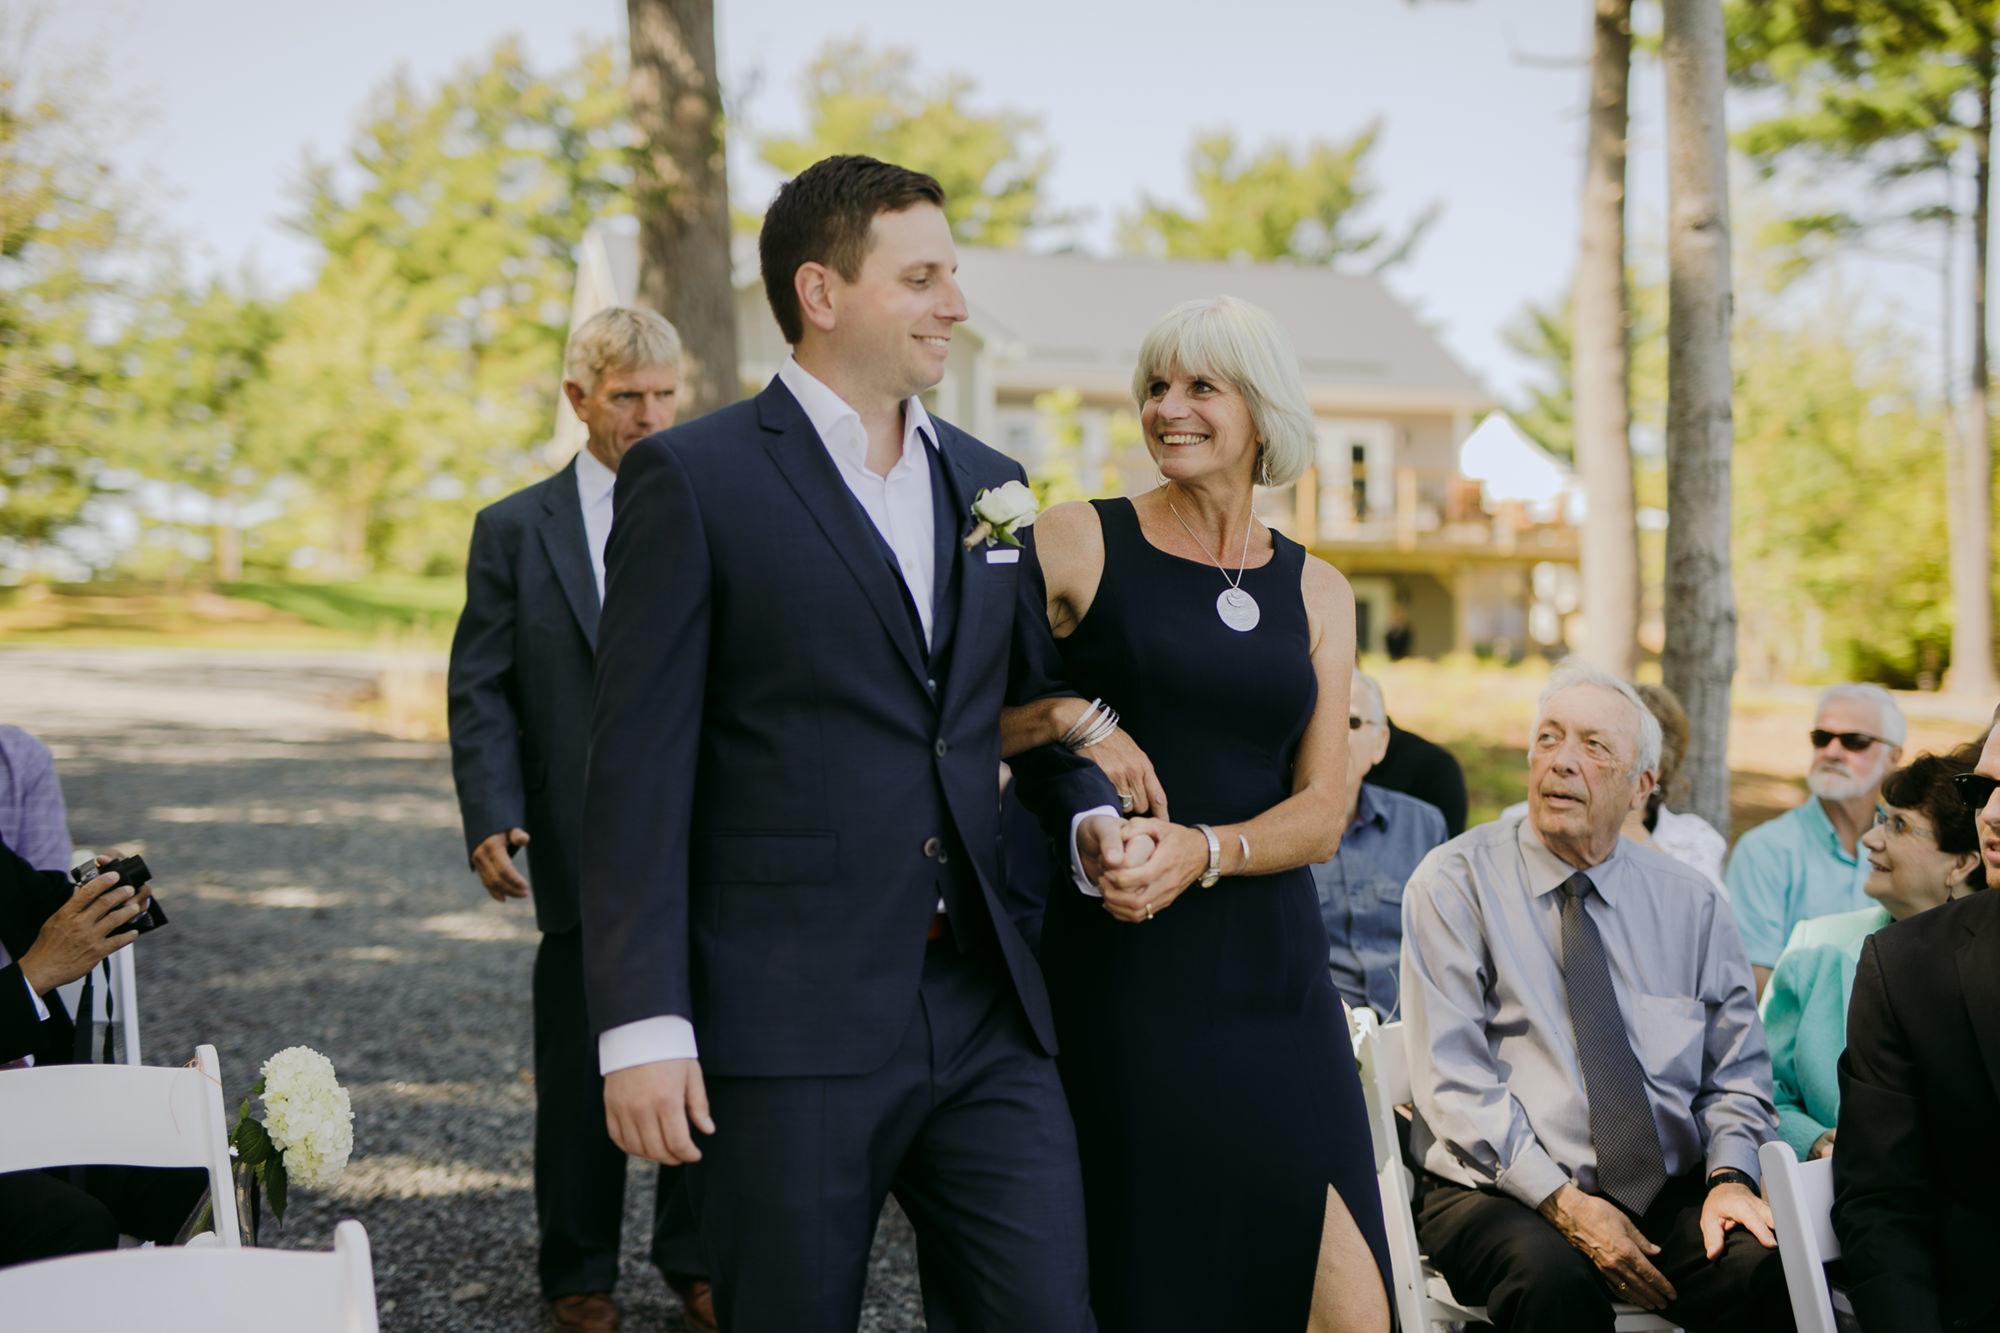 Nova Scotia Wedding -03.JPG